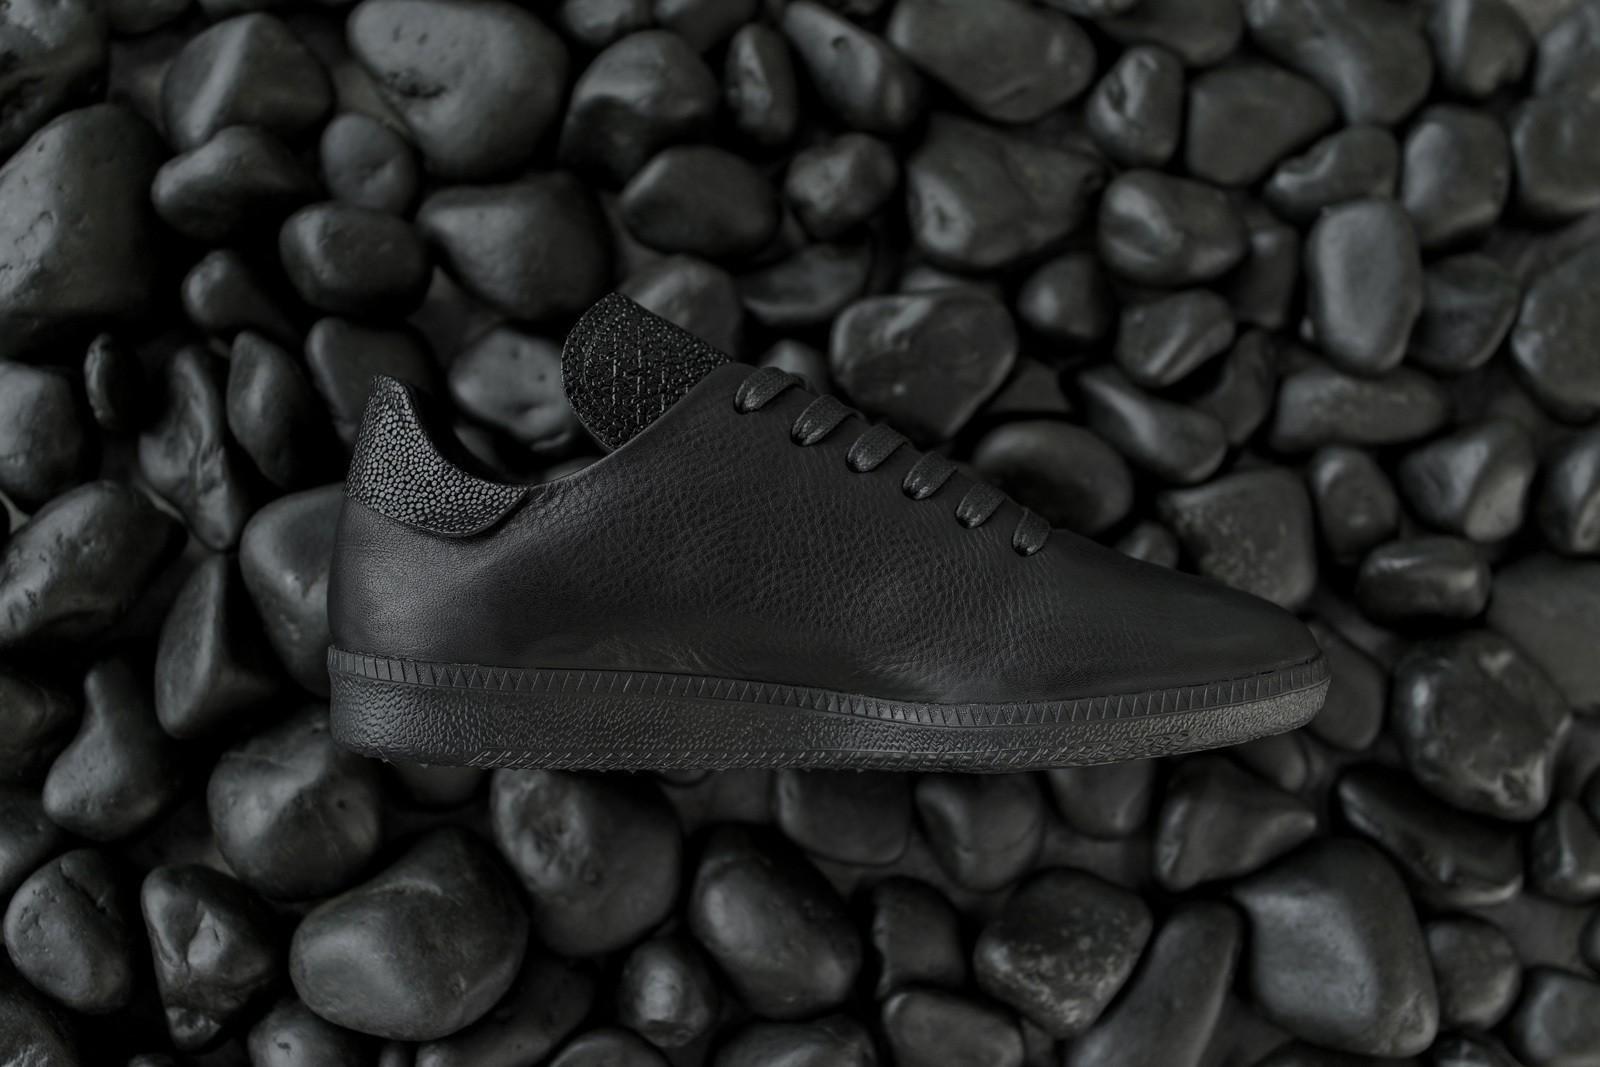 No.One's Triple Black Bravo Sneakers